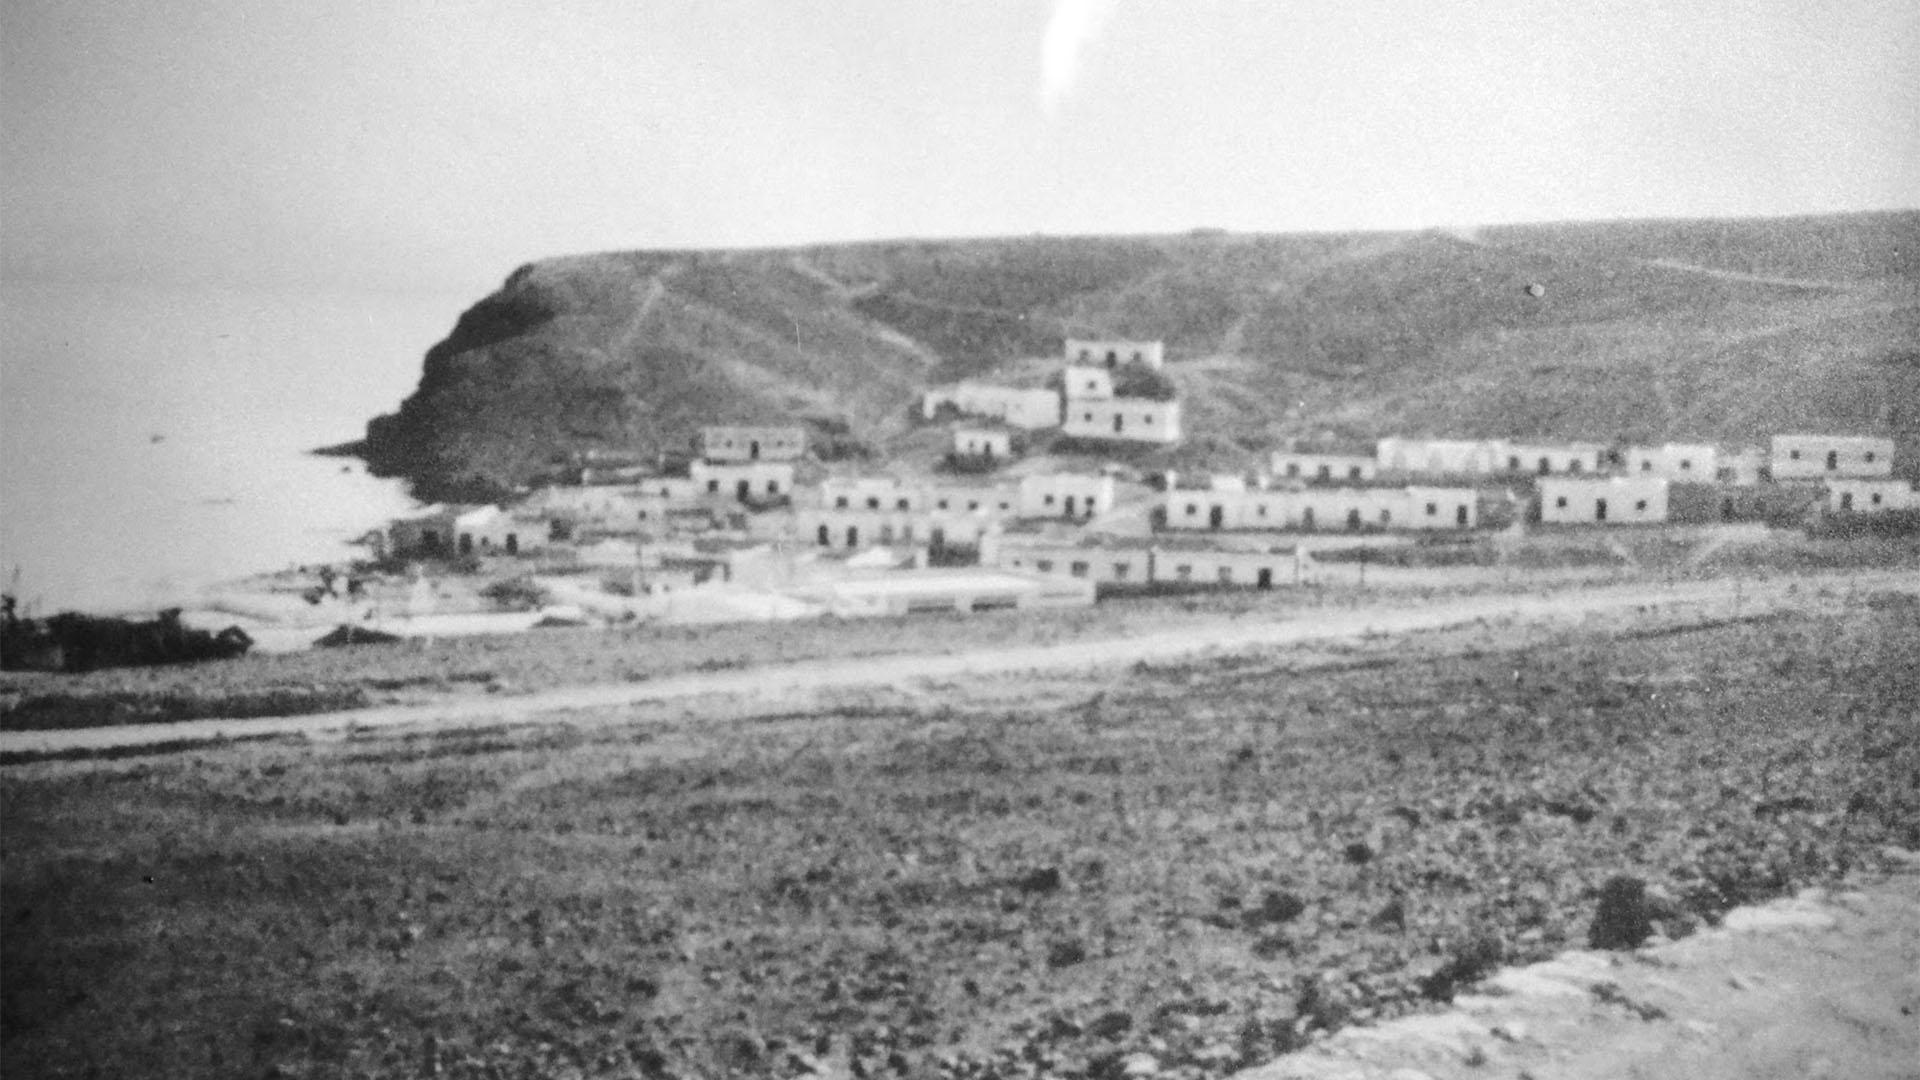 Der Ort Morro Jable Fuerteventura: Morro Jable ca. in den 1950igern.